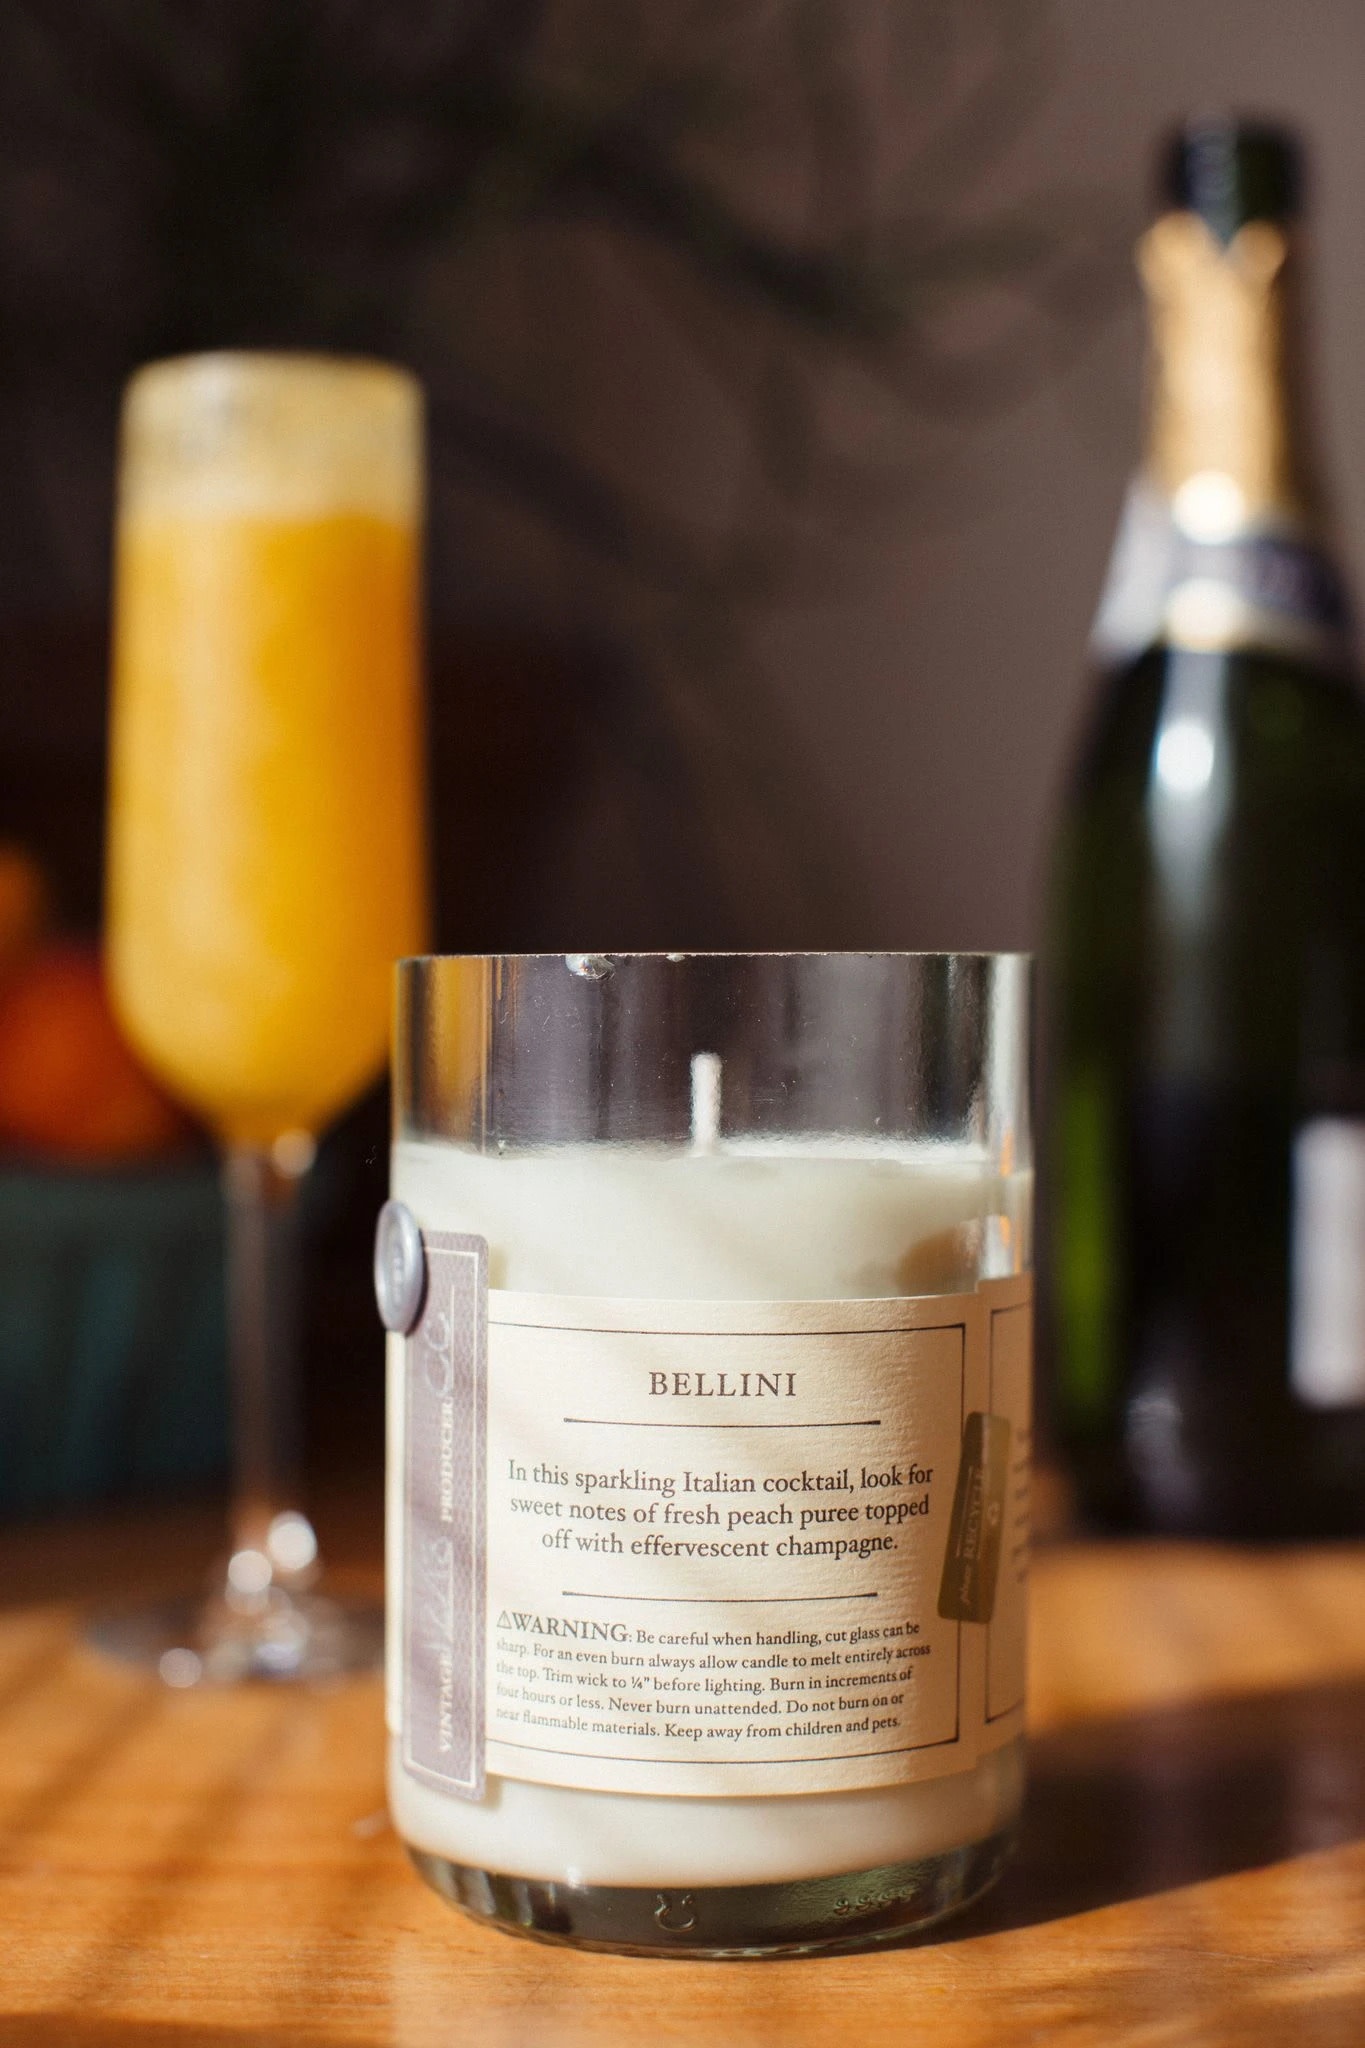 Rewined Rewined Candle Bellini